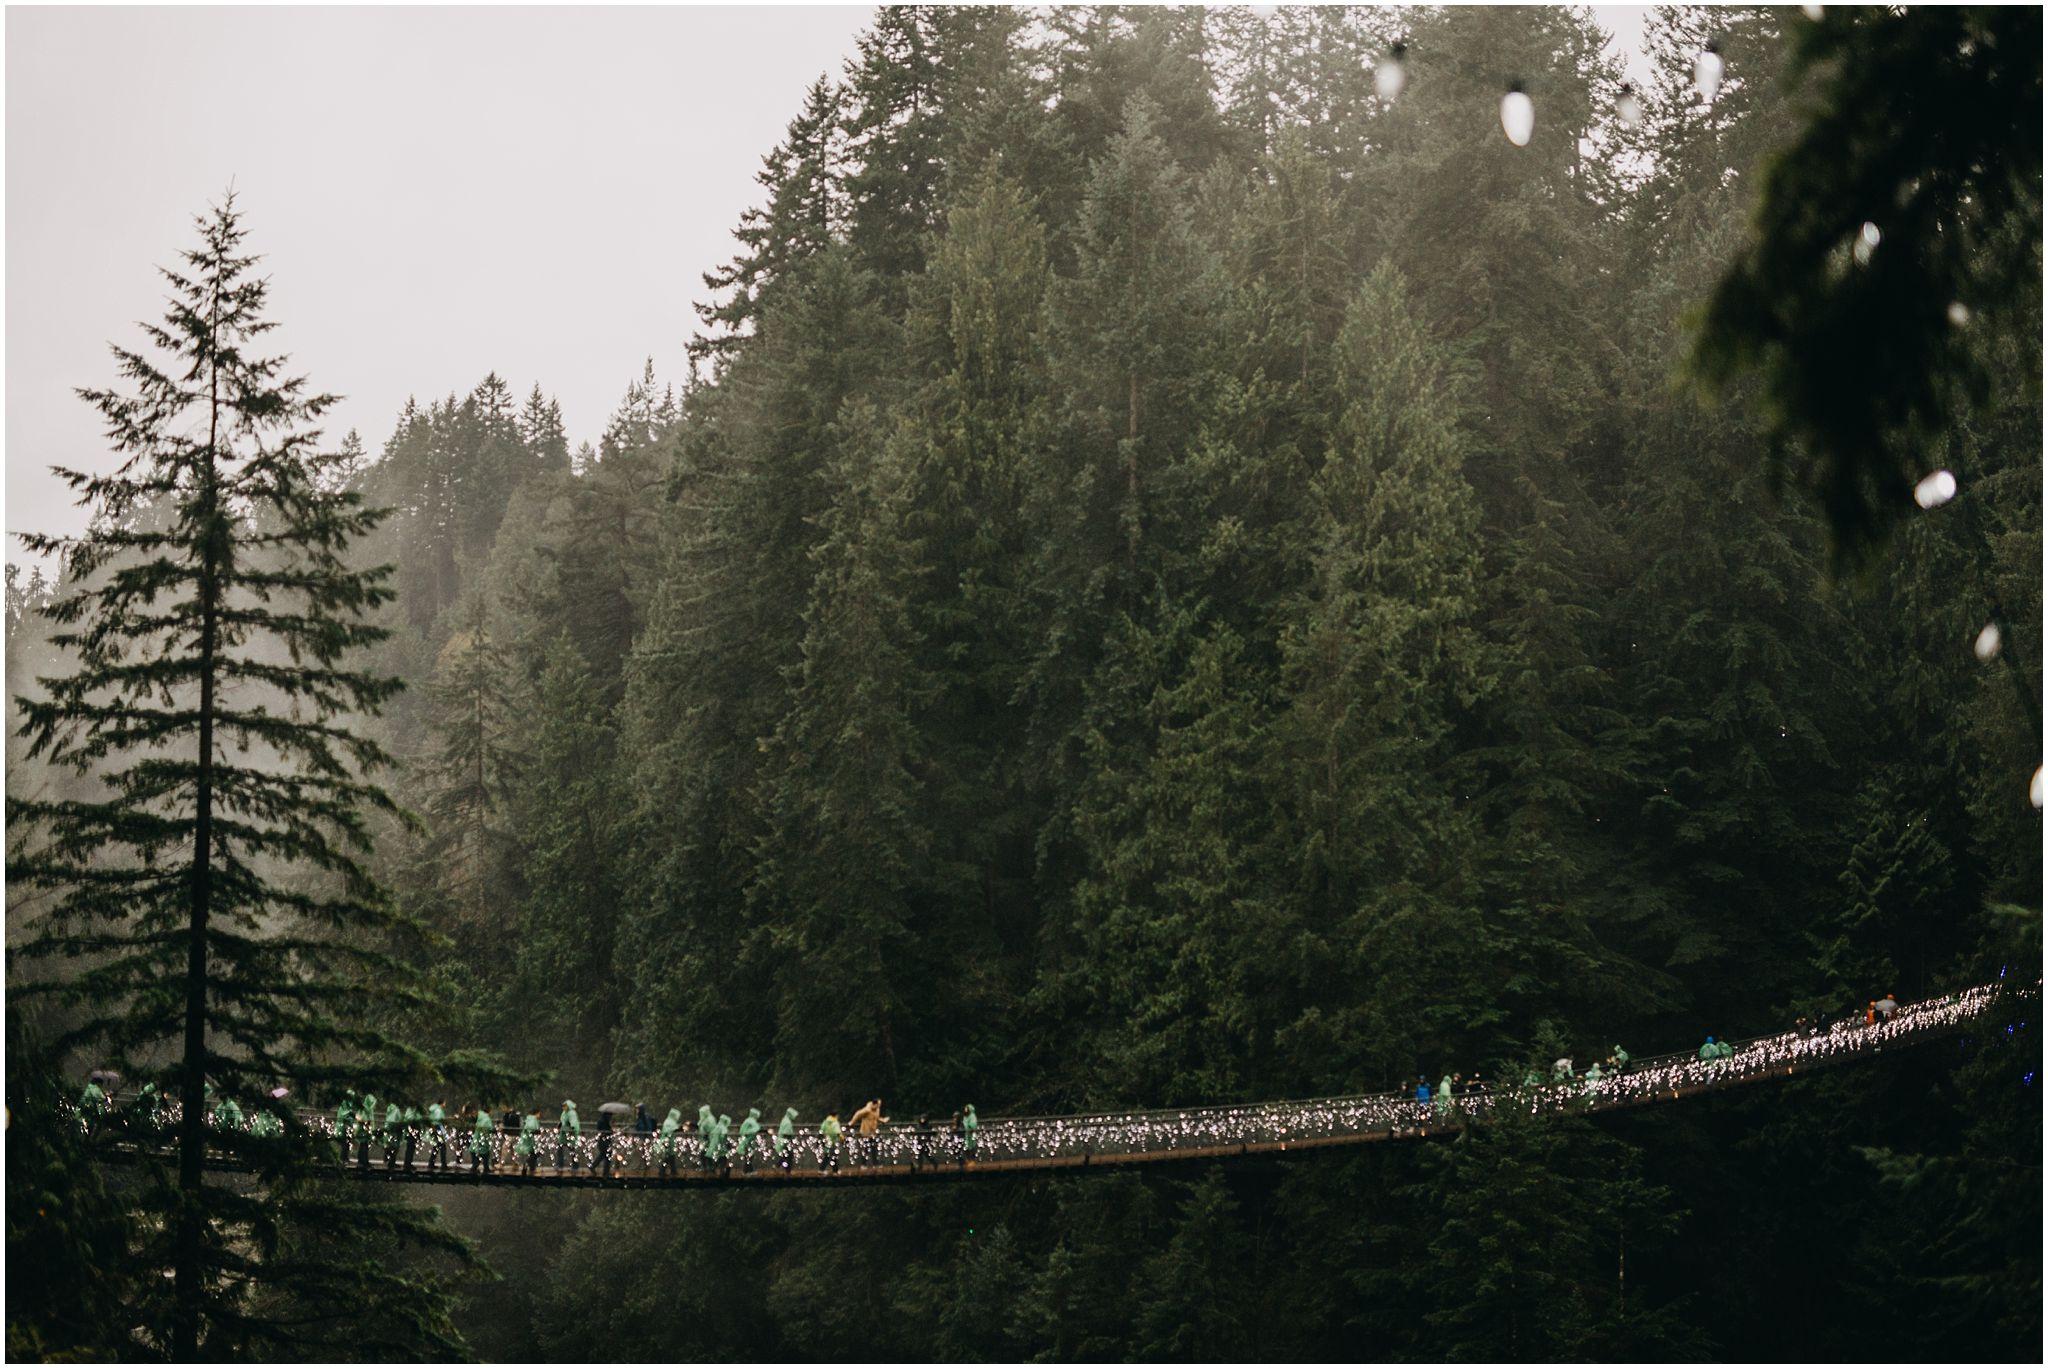 capilano suspension bridge forest trees north vancouver rainy pnw